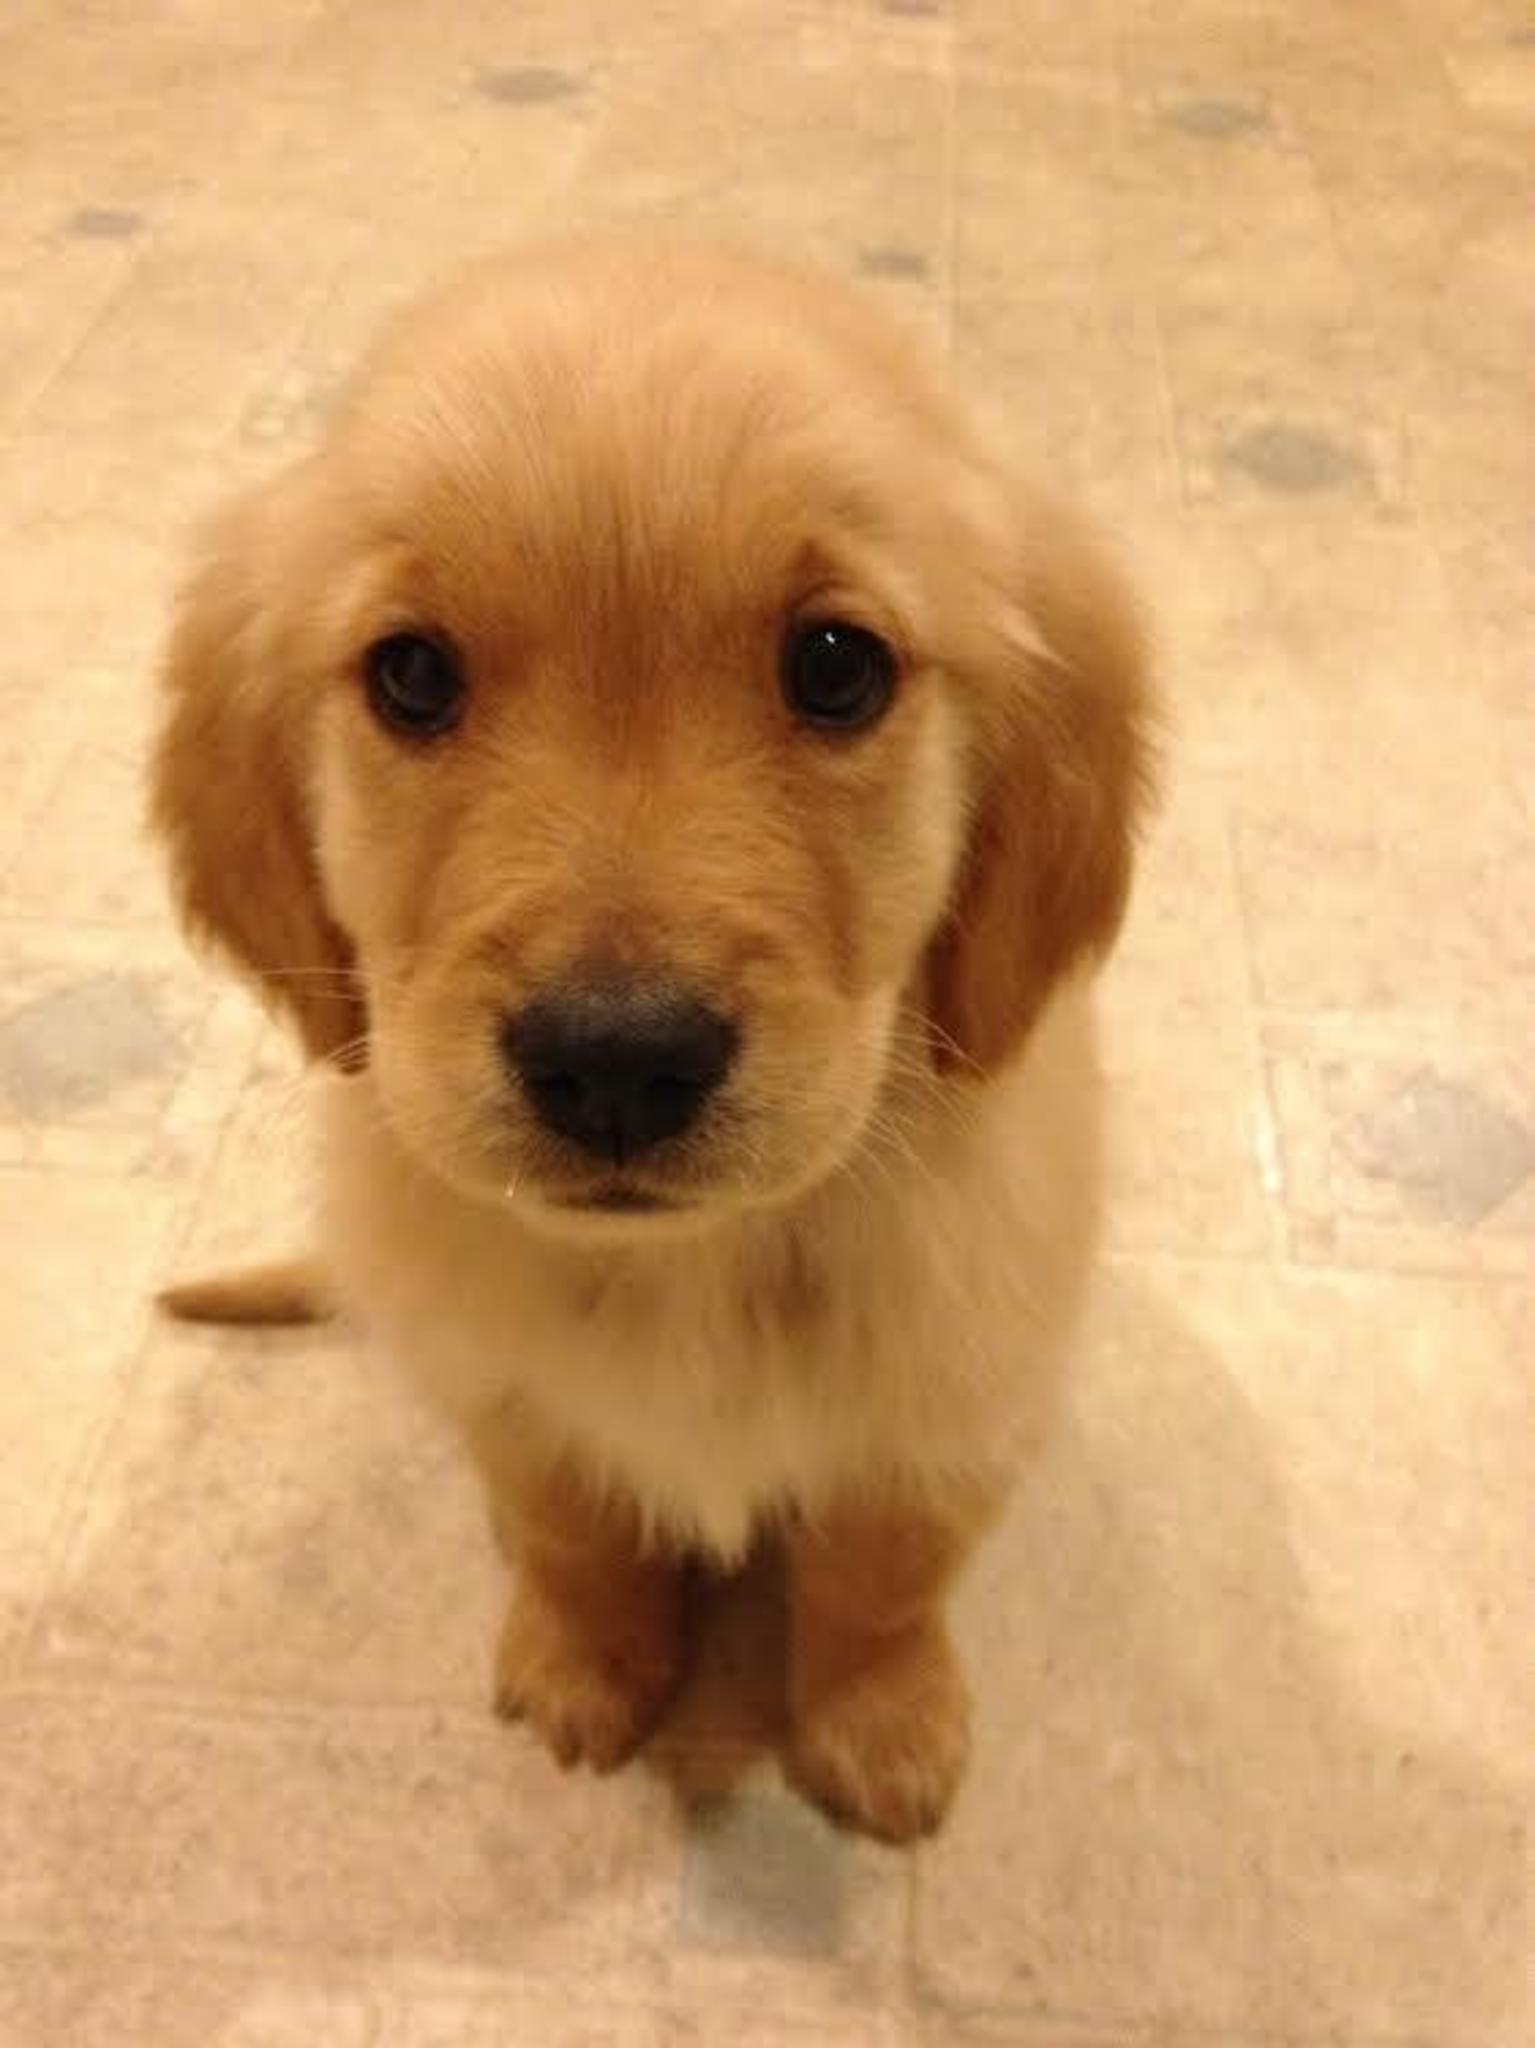 So much cuteness Puppy Puppy Dog Eyes